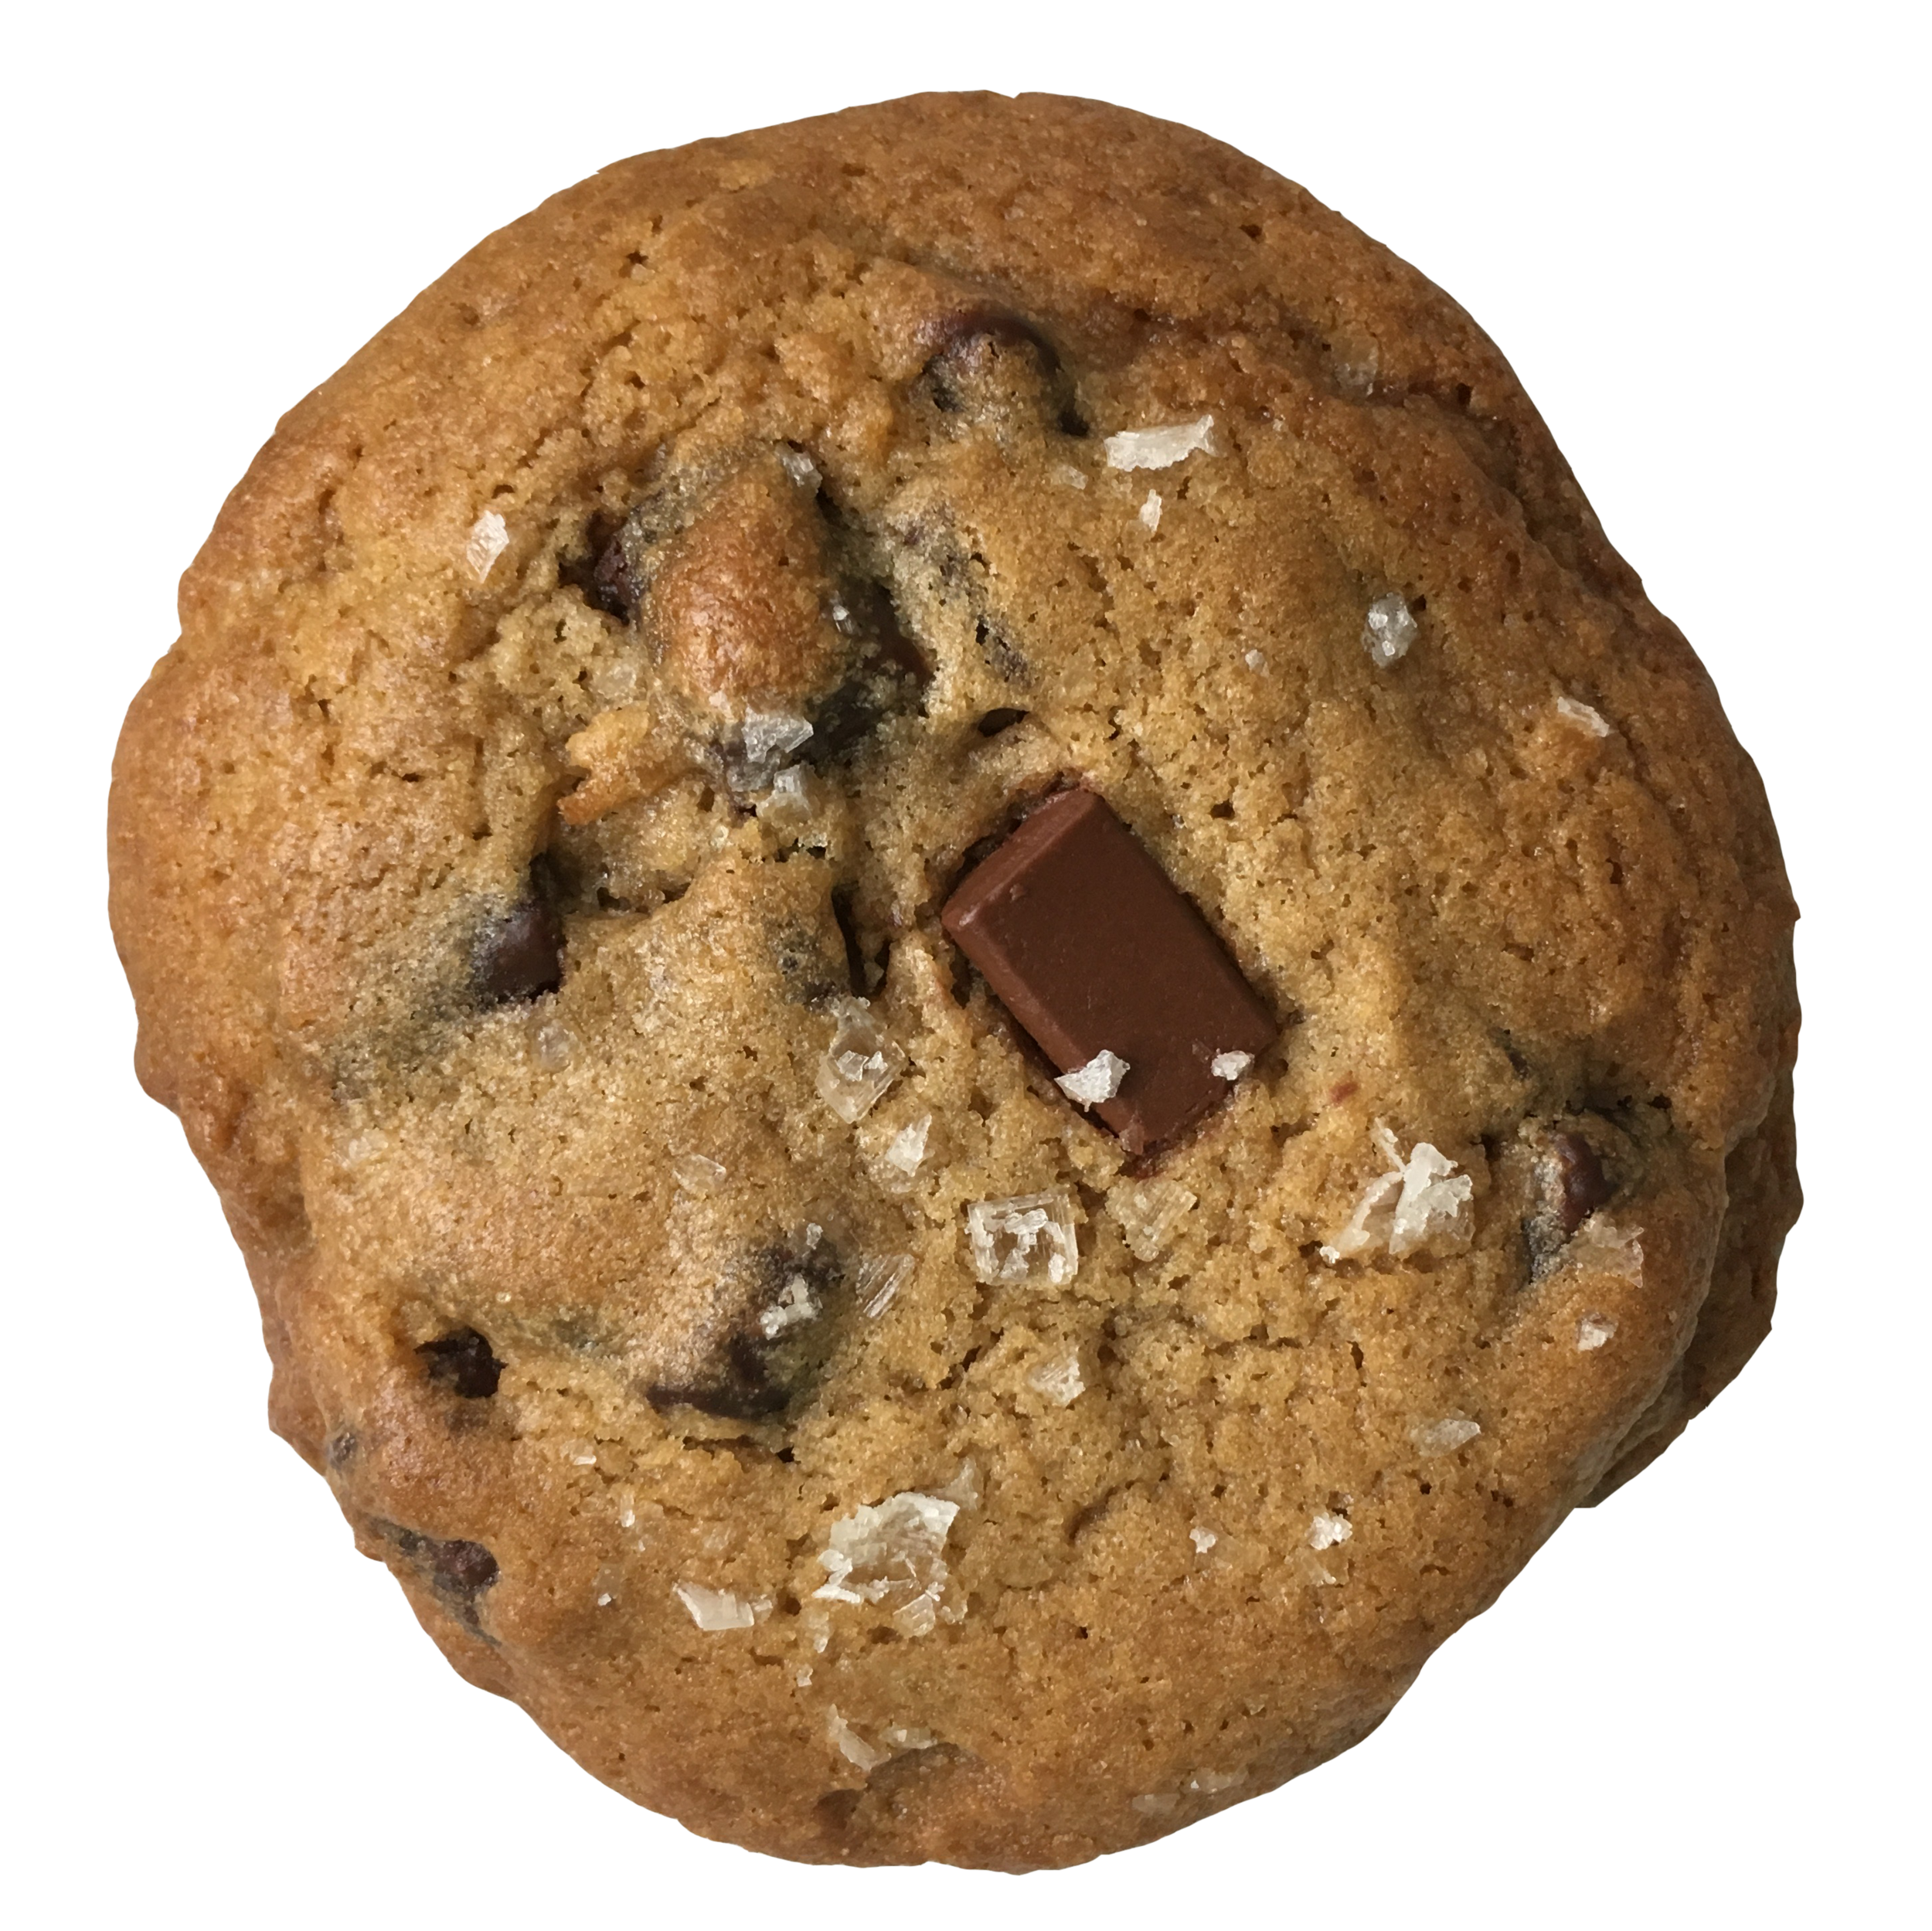 CLASSIC ROCK (it's only rock n roll but i like it) dark chocolate chunks & maldon salt